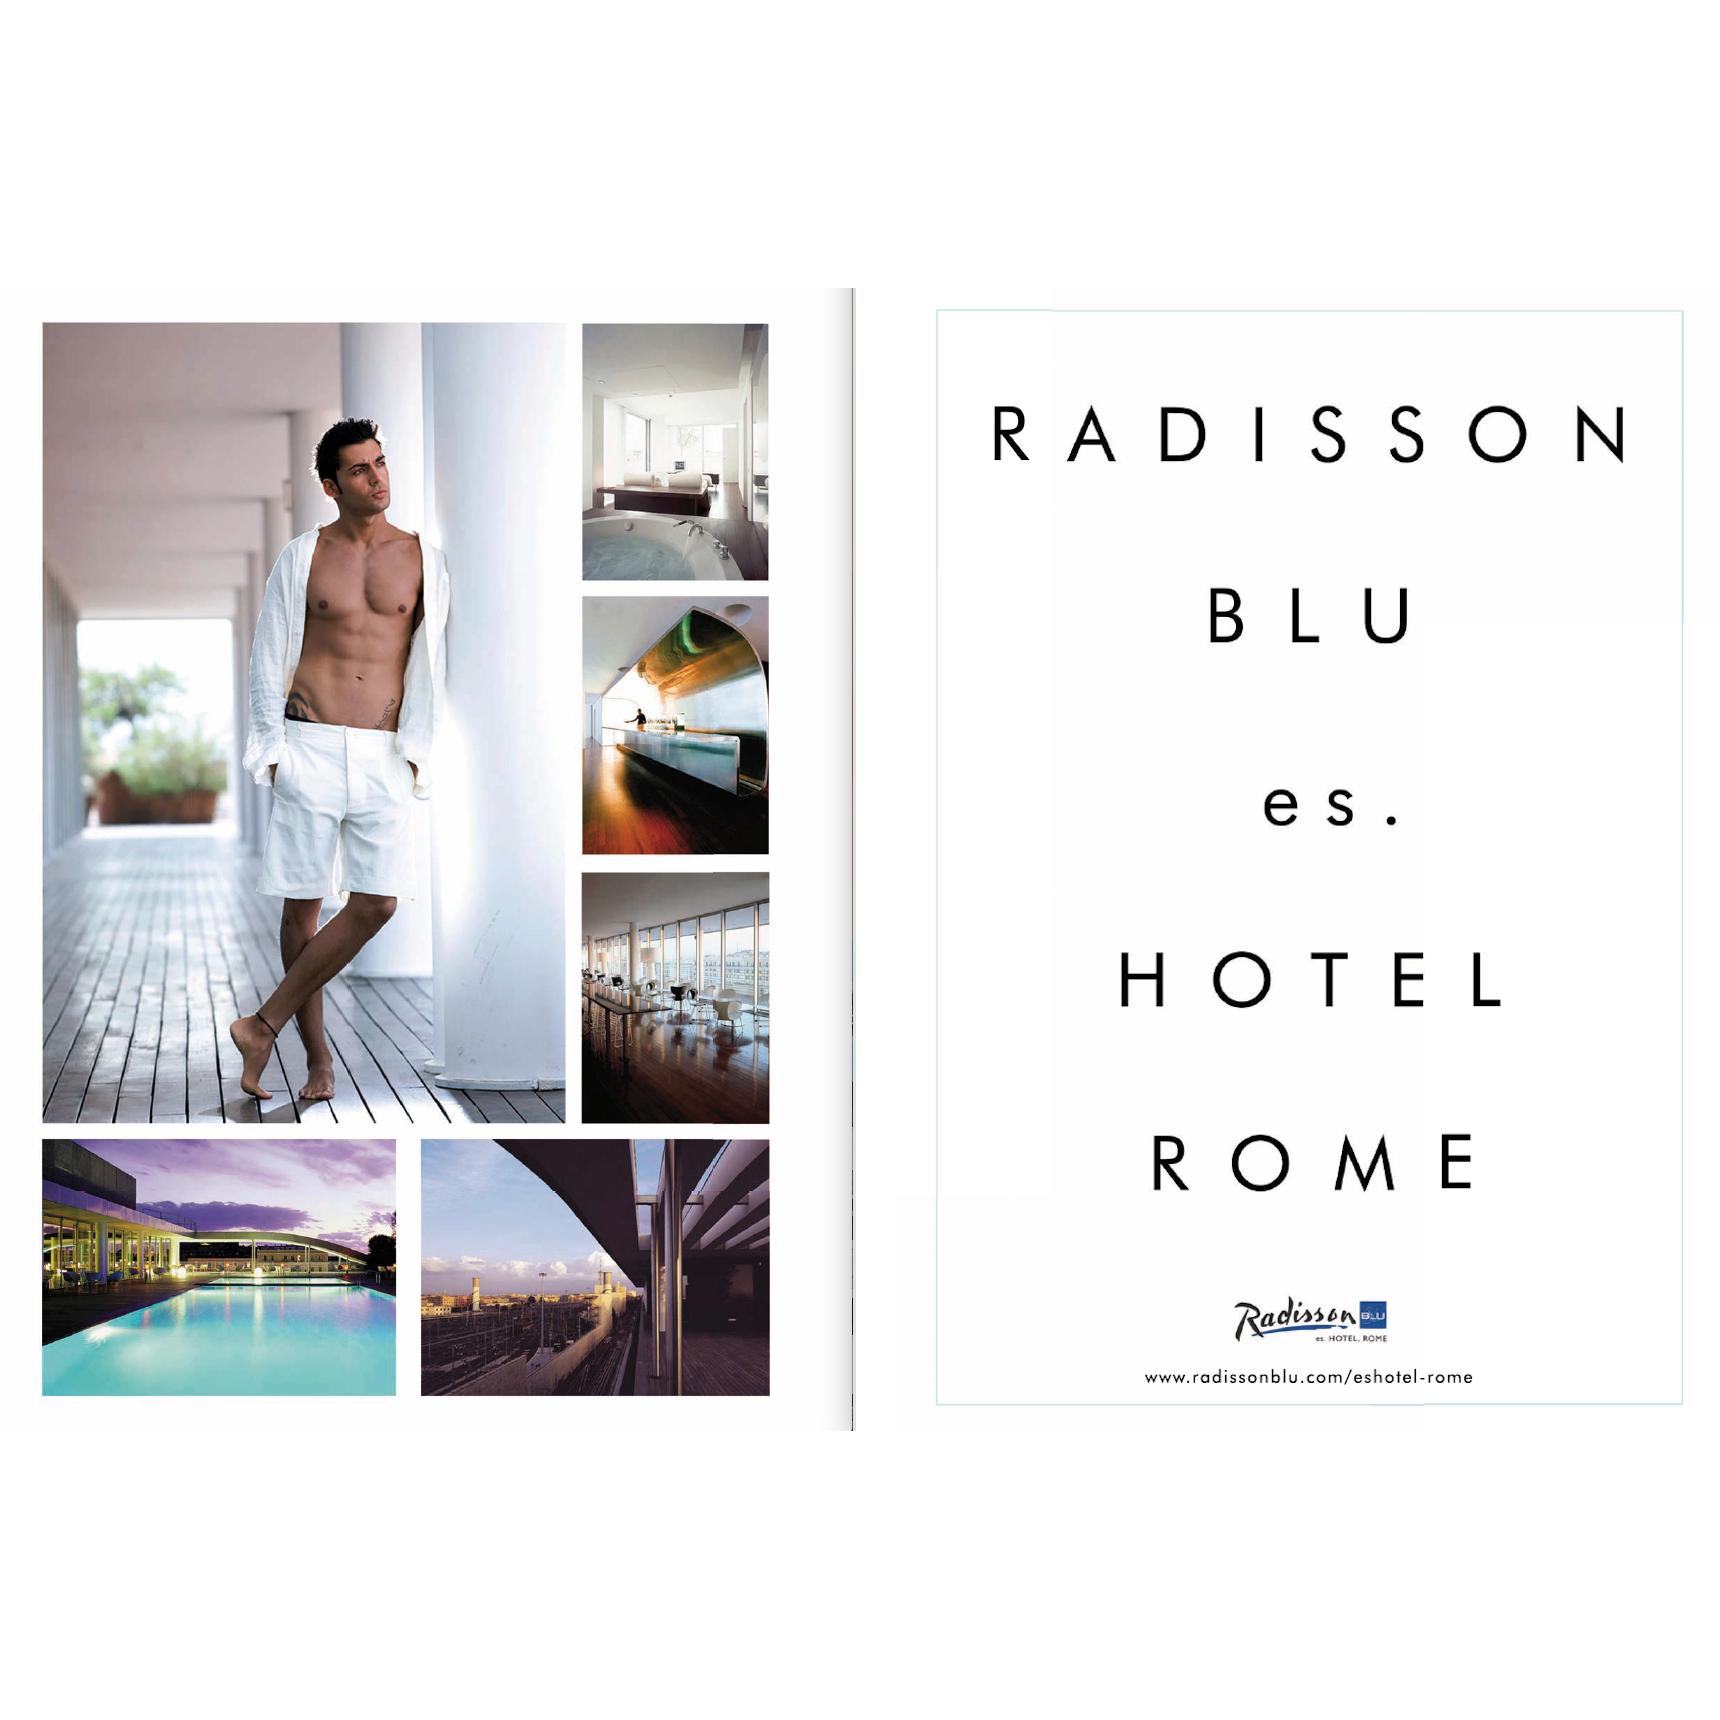 Radisson Blu Hotel Roma Ads